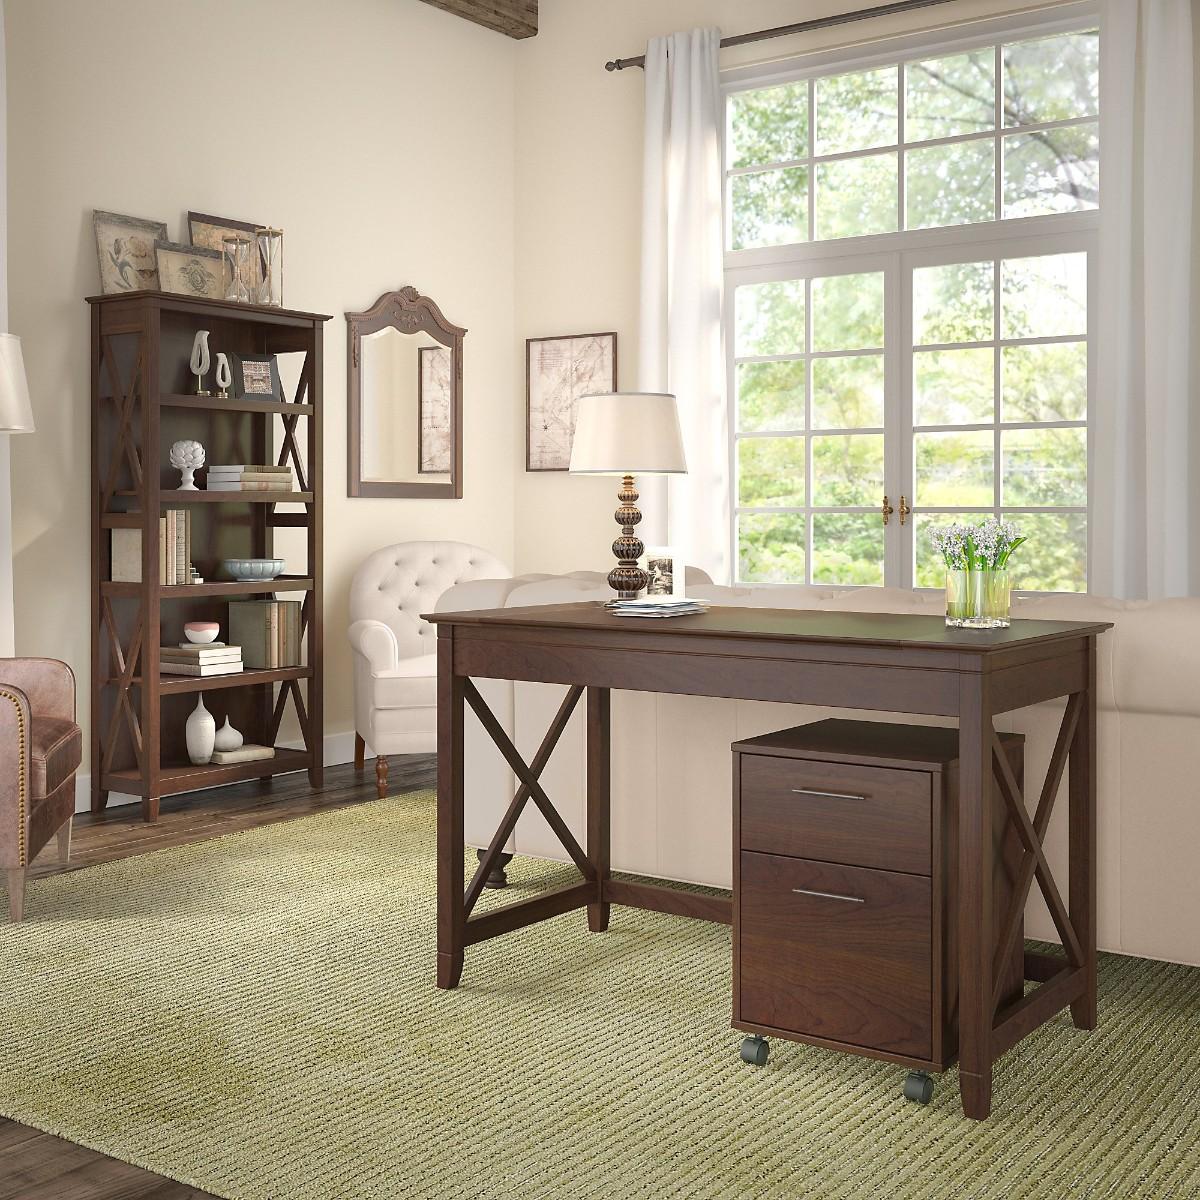 Writing Desk Drawer Mobile Pedestal Shelf Bookcase Bing Cherry